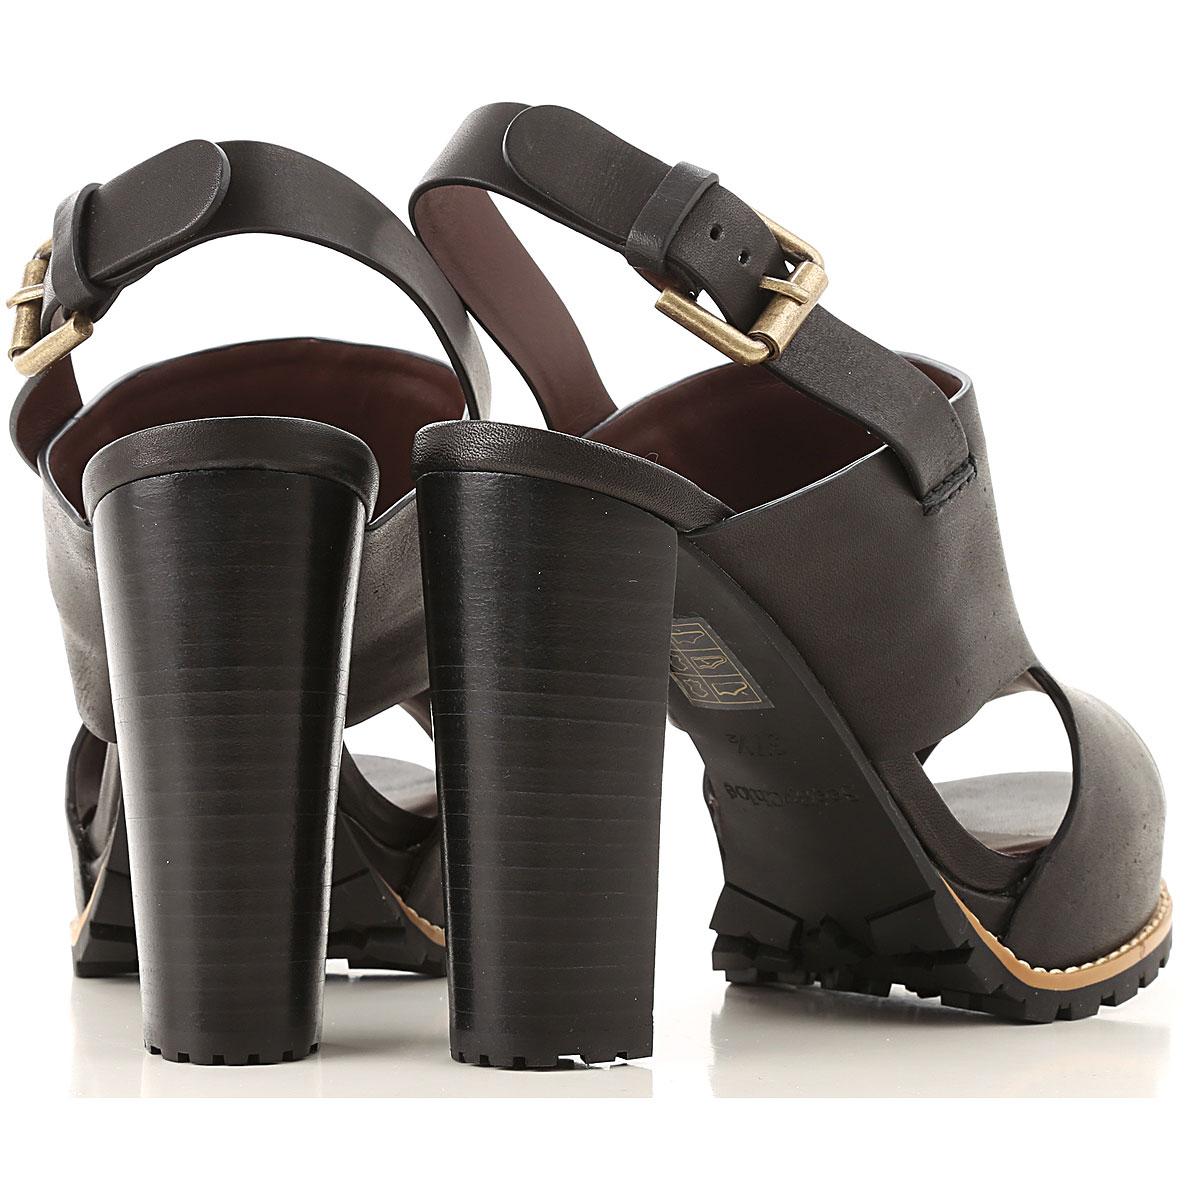 Para Negro By verano See Chloe nbsp; Mujer 2019 Zapatos Primavera pWTpqcvO